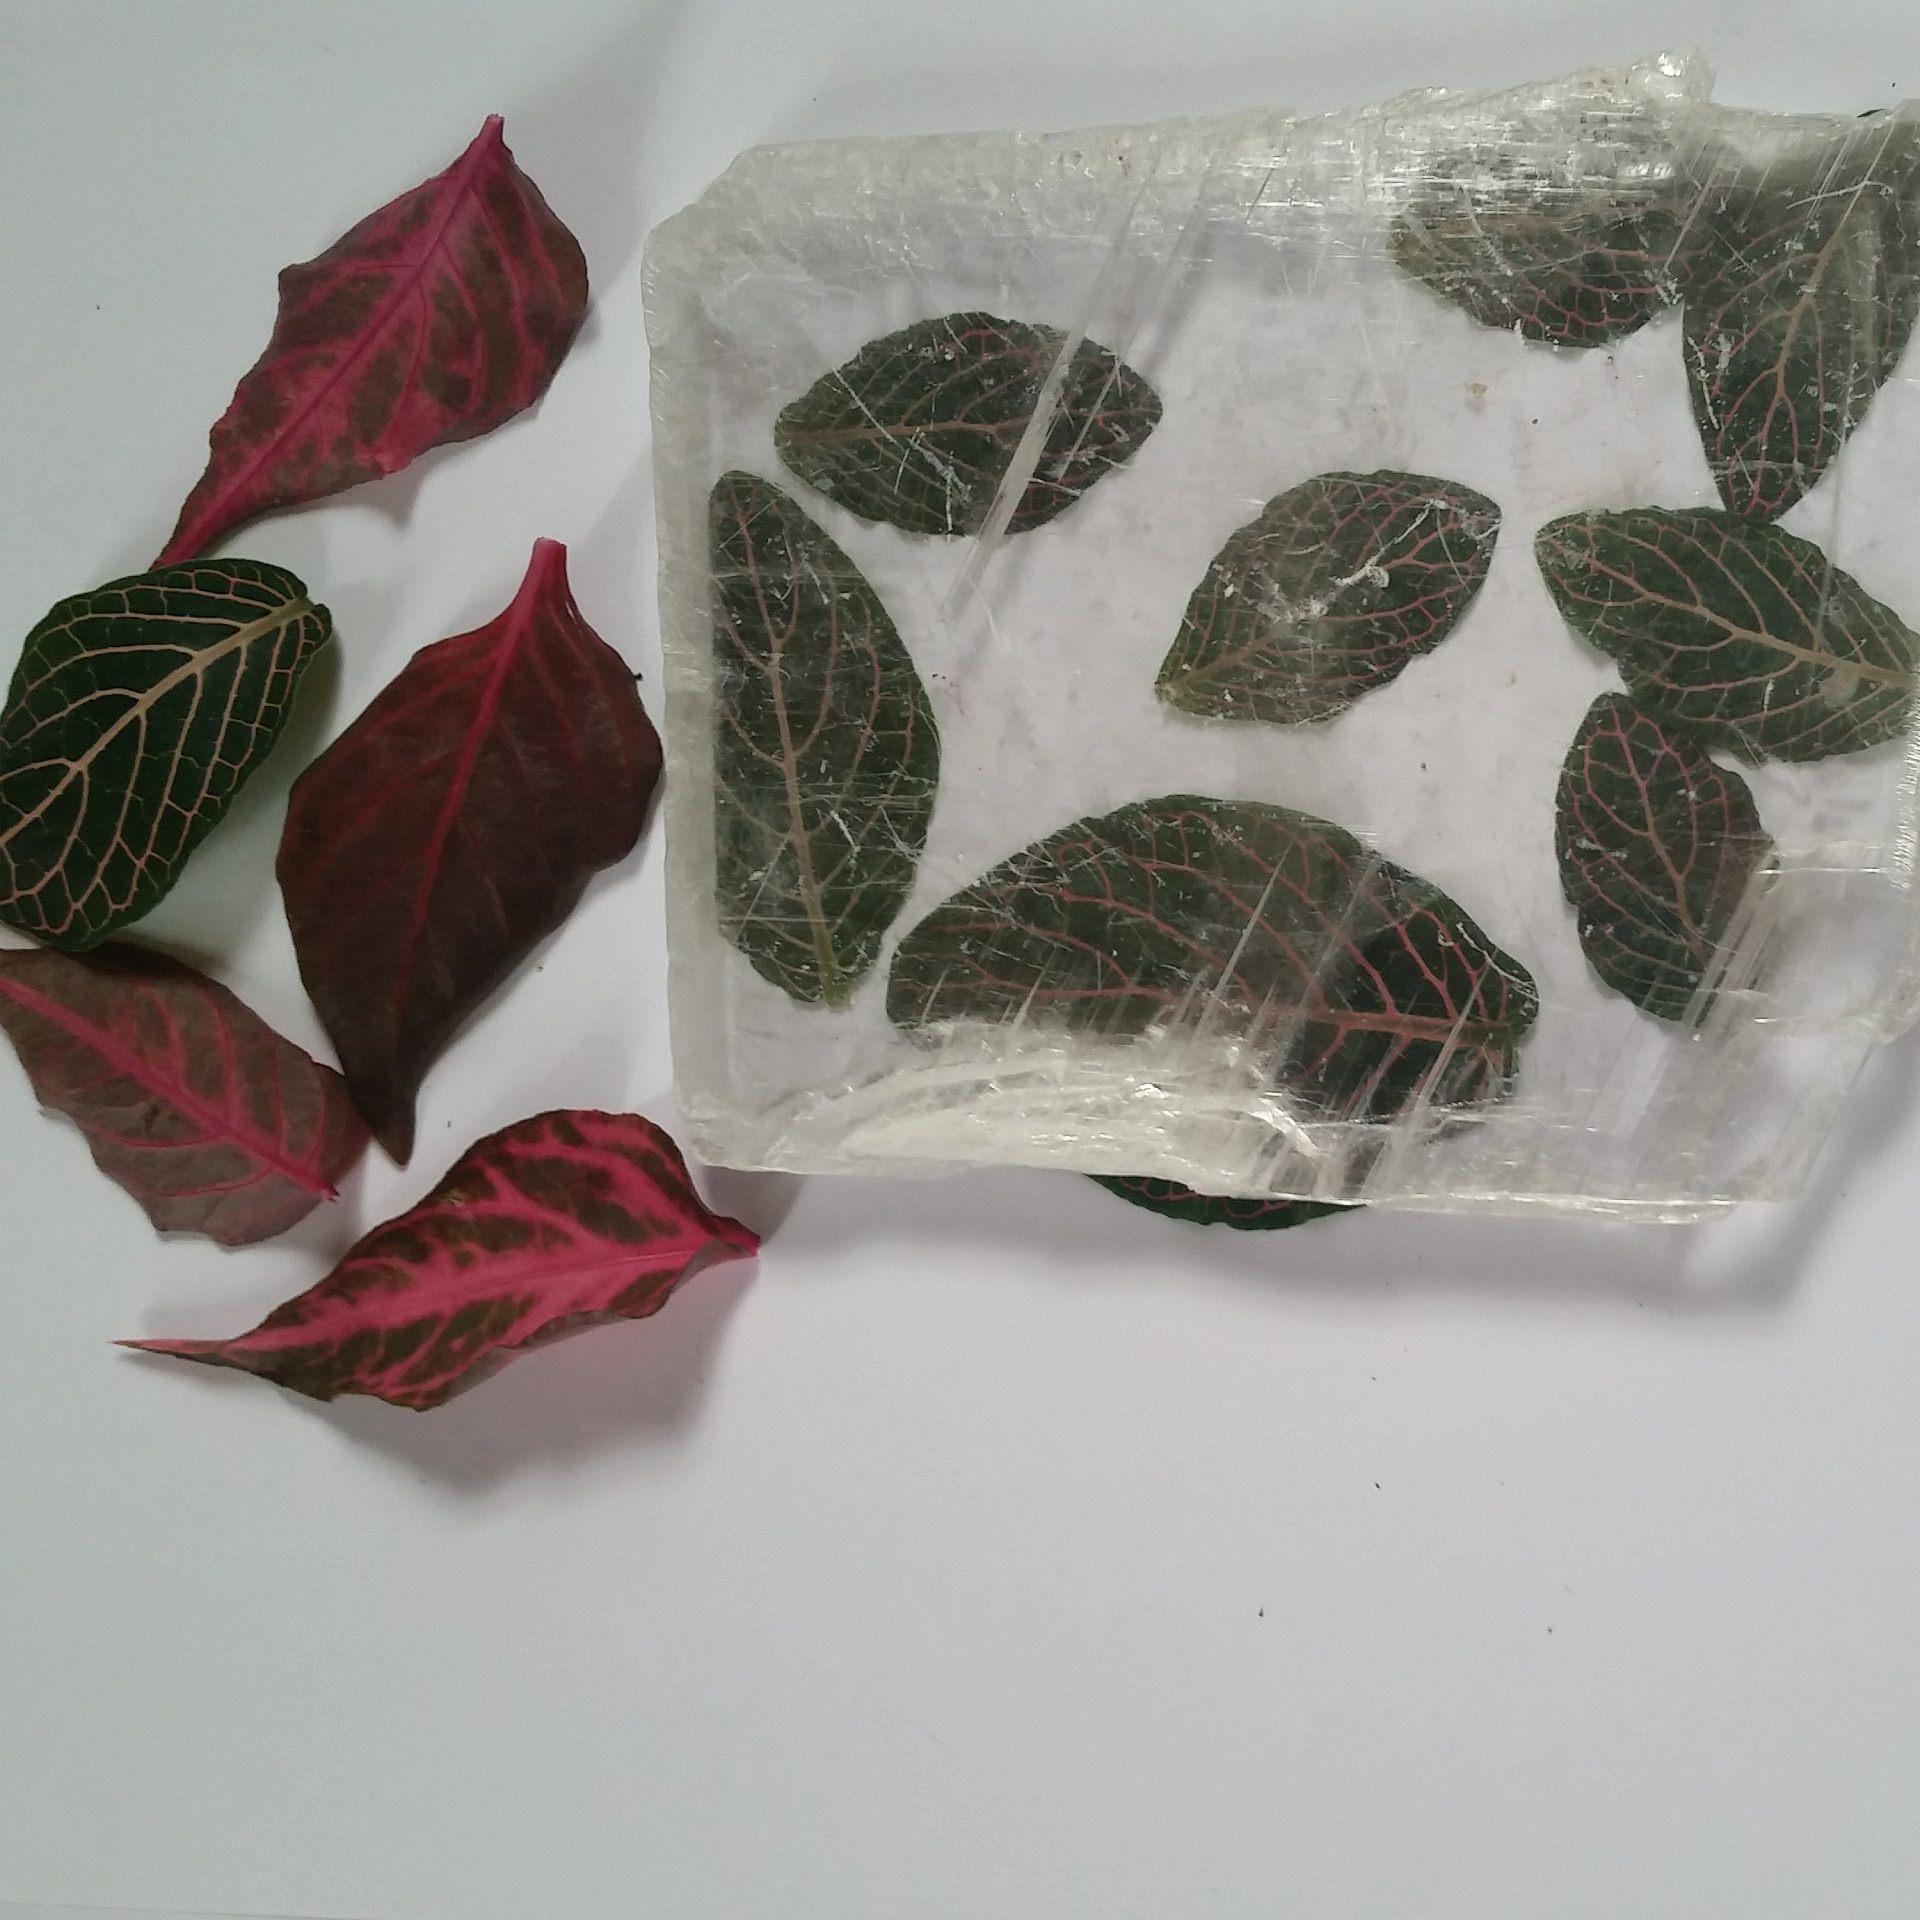 Fittonia Leaves (native to Peru)